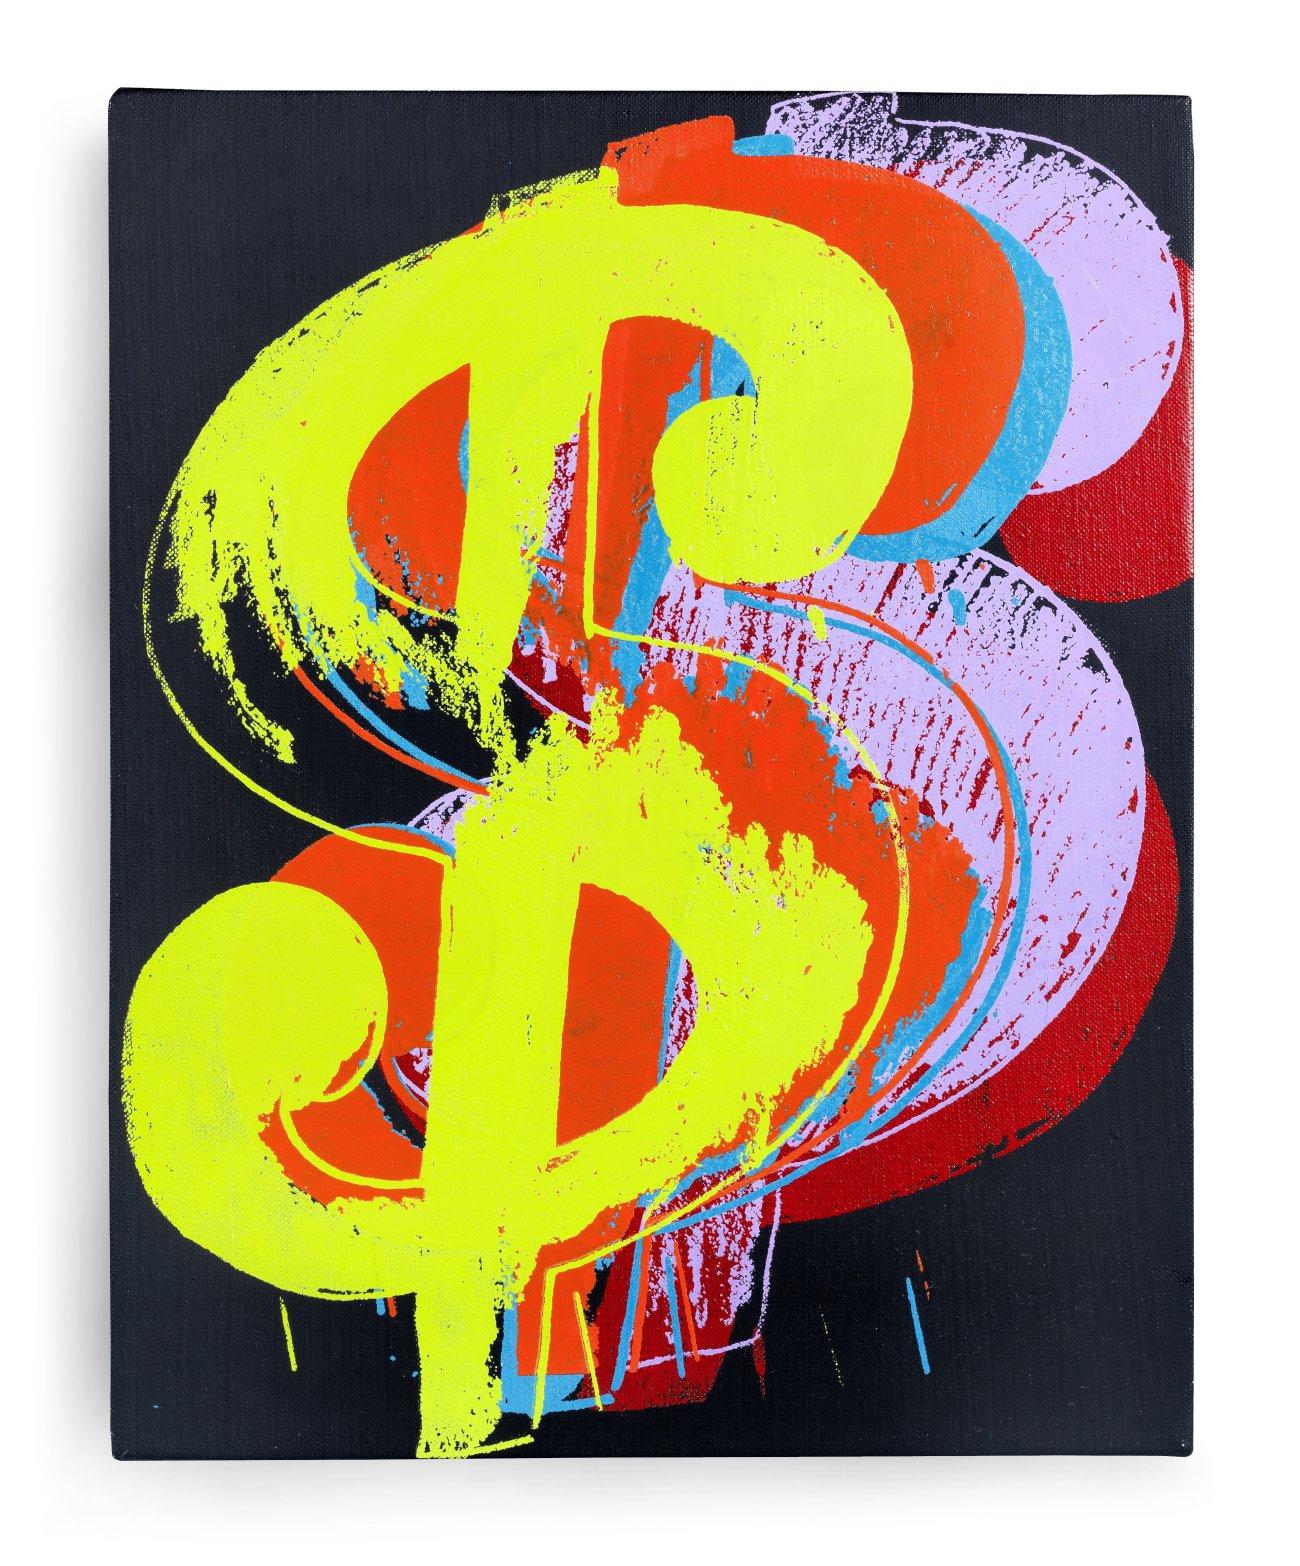 Lot 21 - Andy Warhol (1928-1987) Dollar Sign 1982